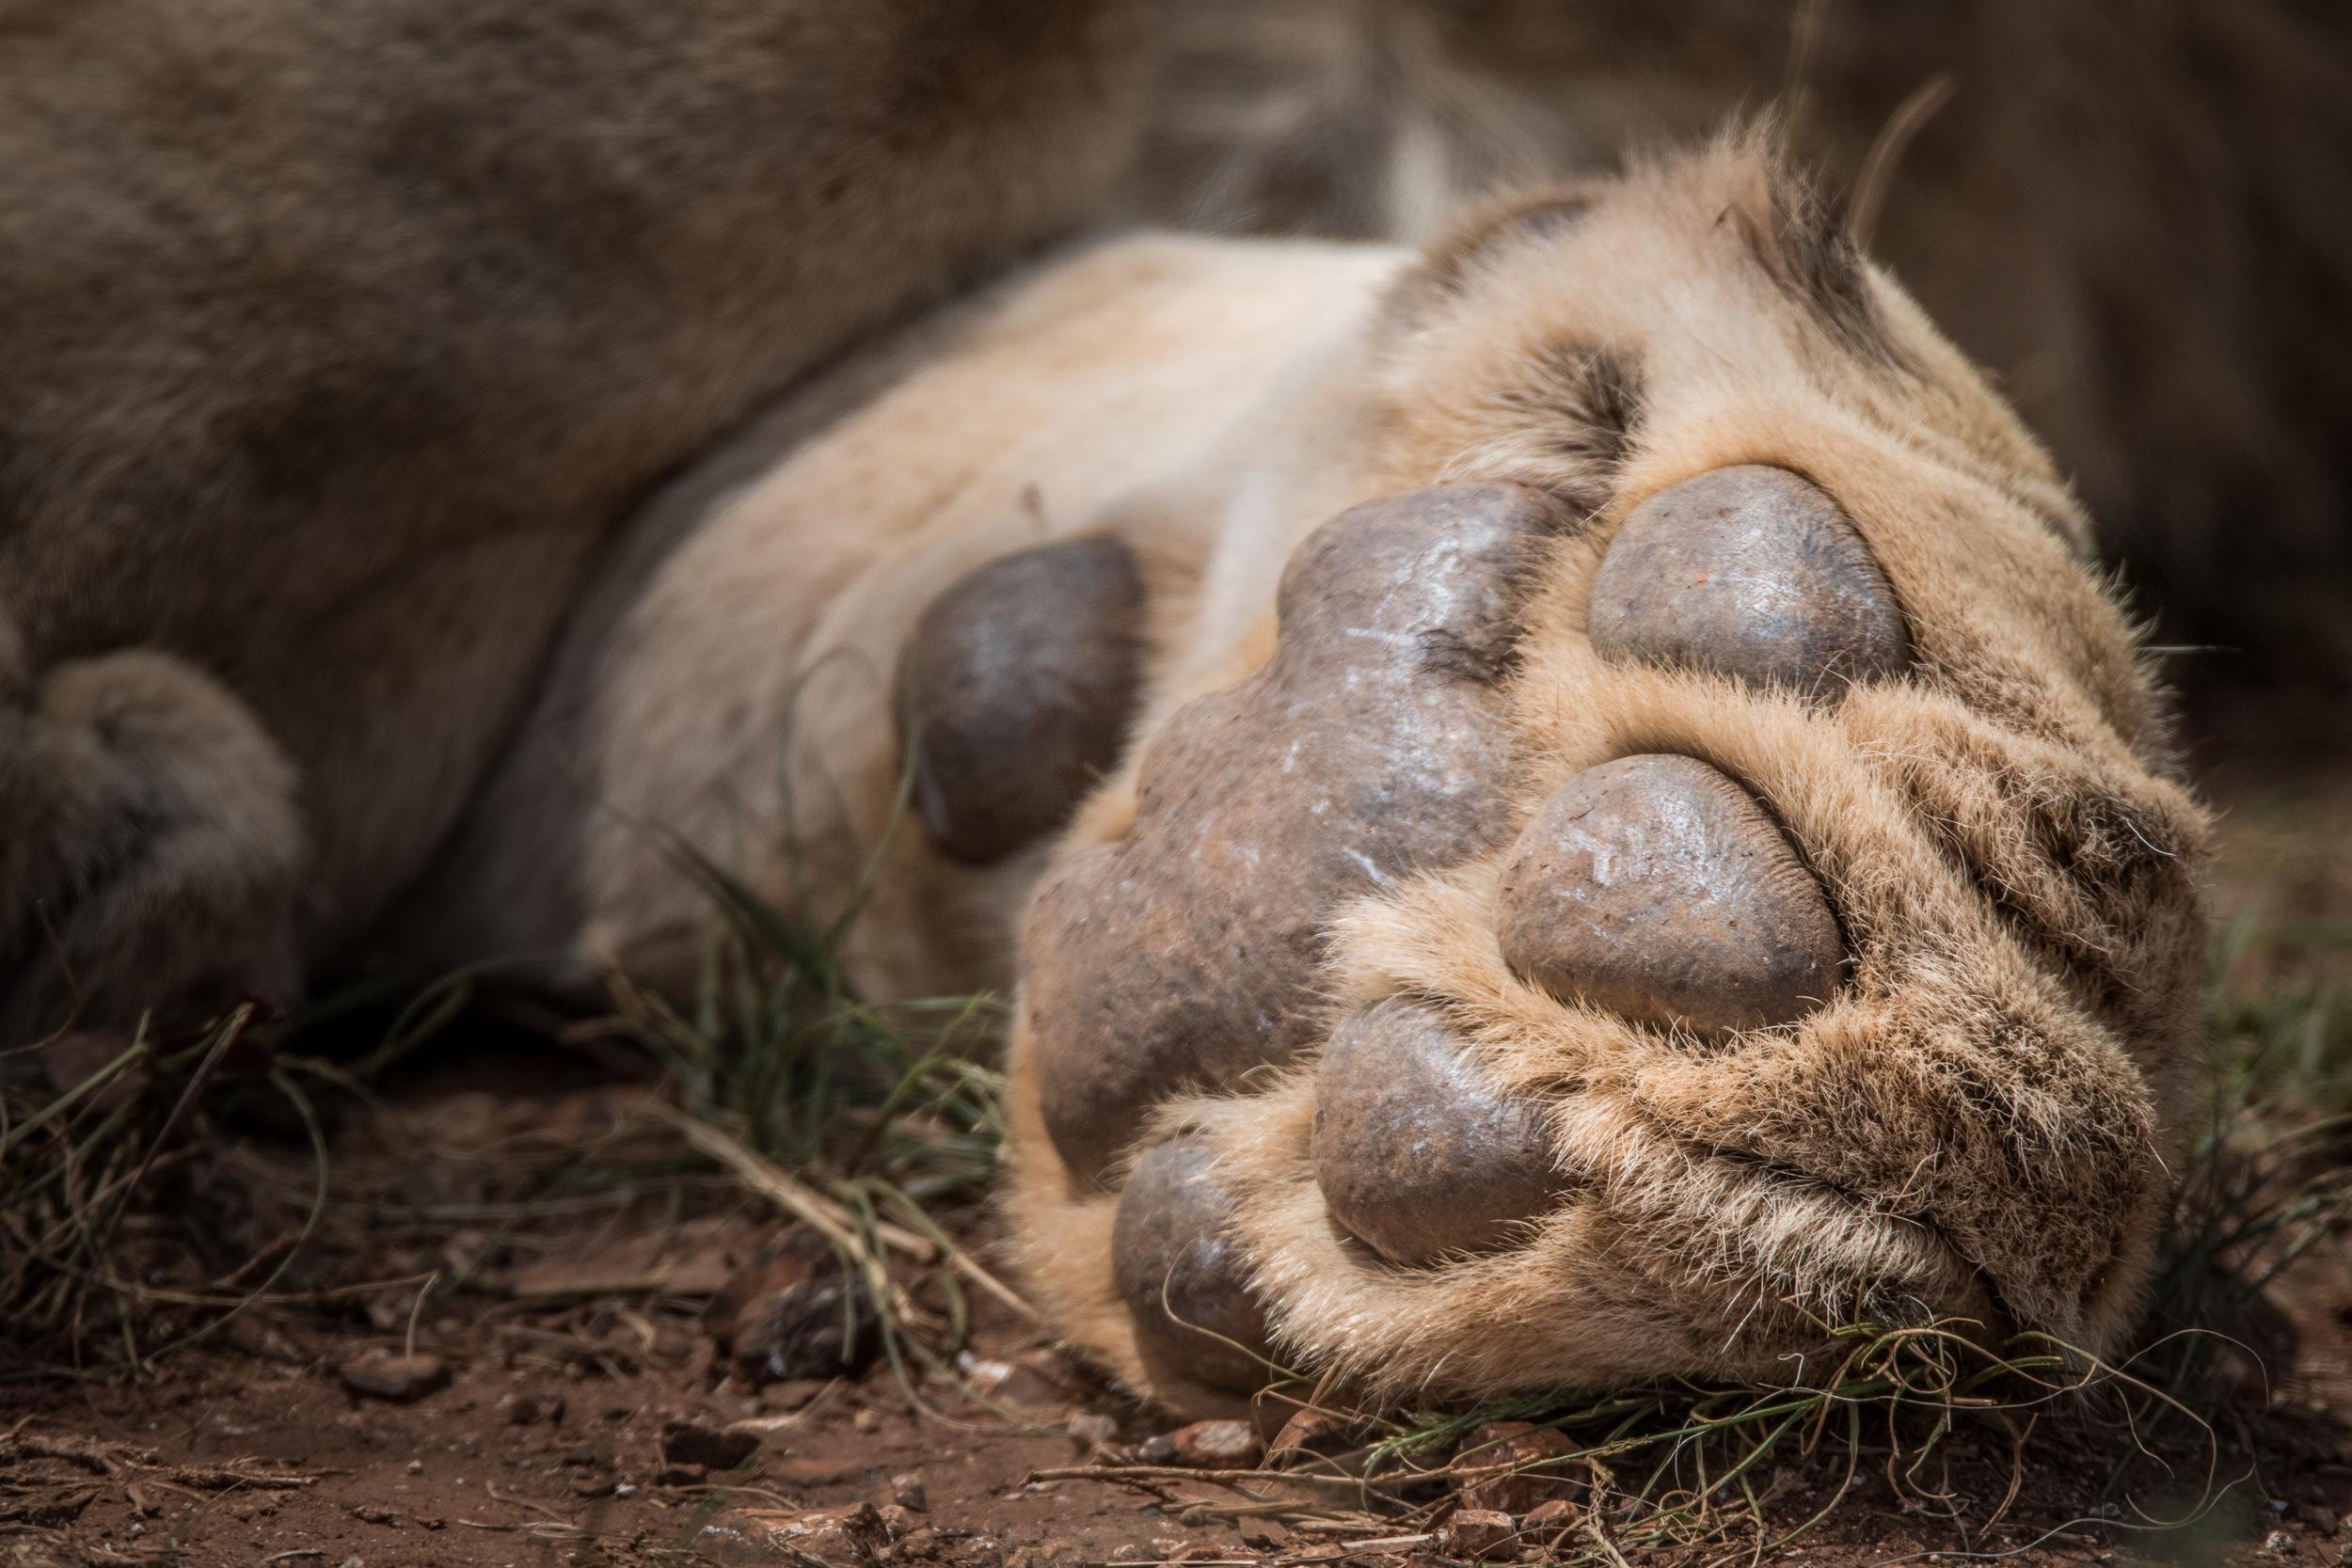 Lions-big-13.jpg